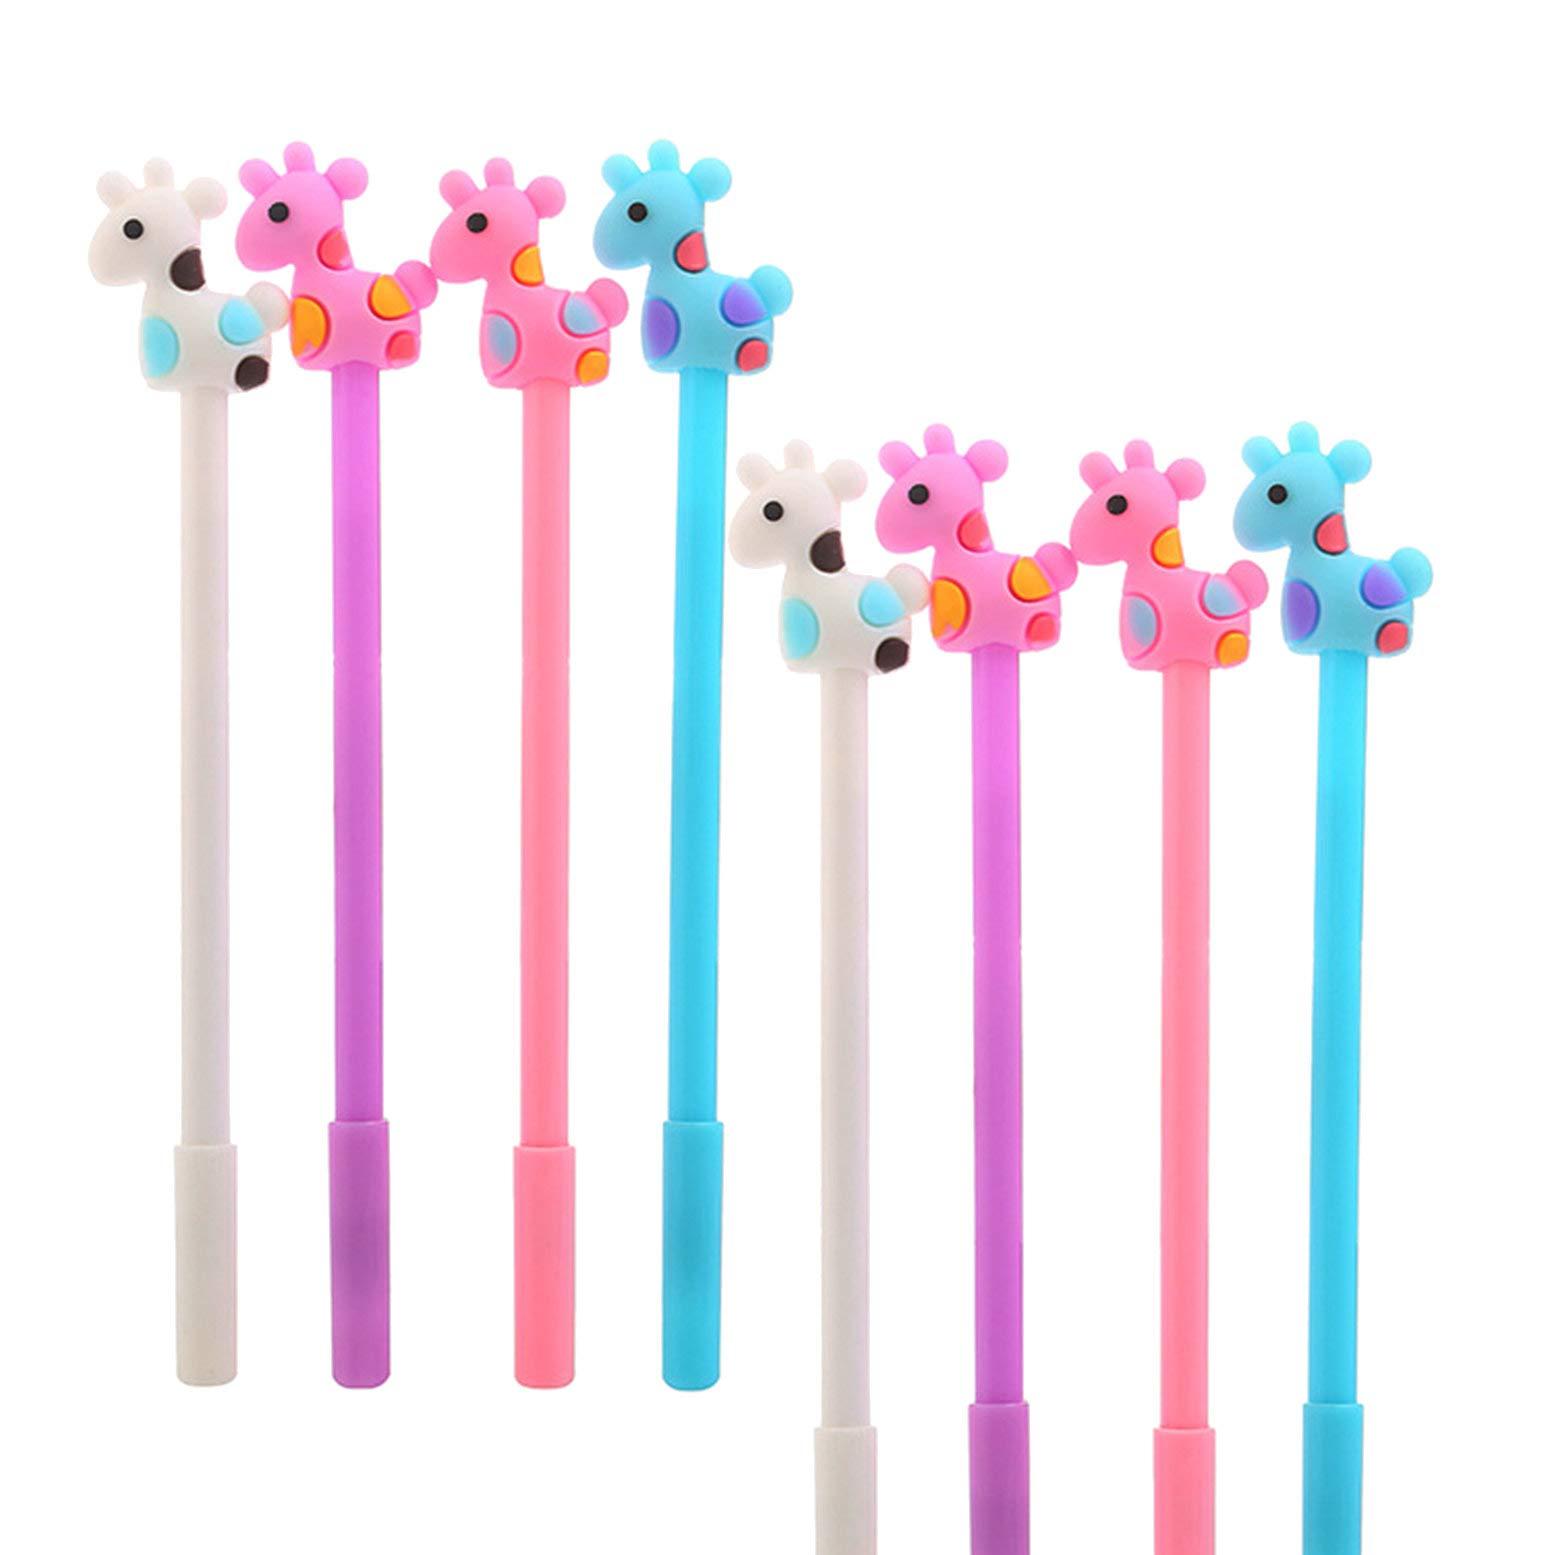 WIN-MARKET Animal Sika Deer Giraffe Gel Pens Fashion Cute Cartoon Colorful Kawaii Lovely Colorful Gel Black Ink Ball Pens 0.38MM Office School Stationery pen(8PCS)